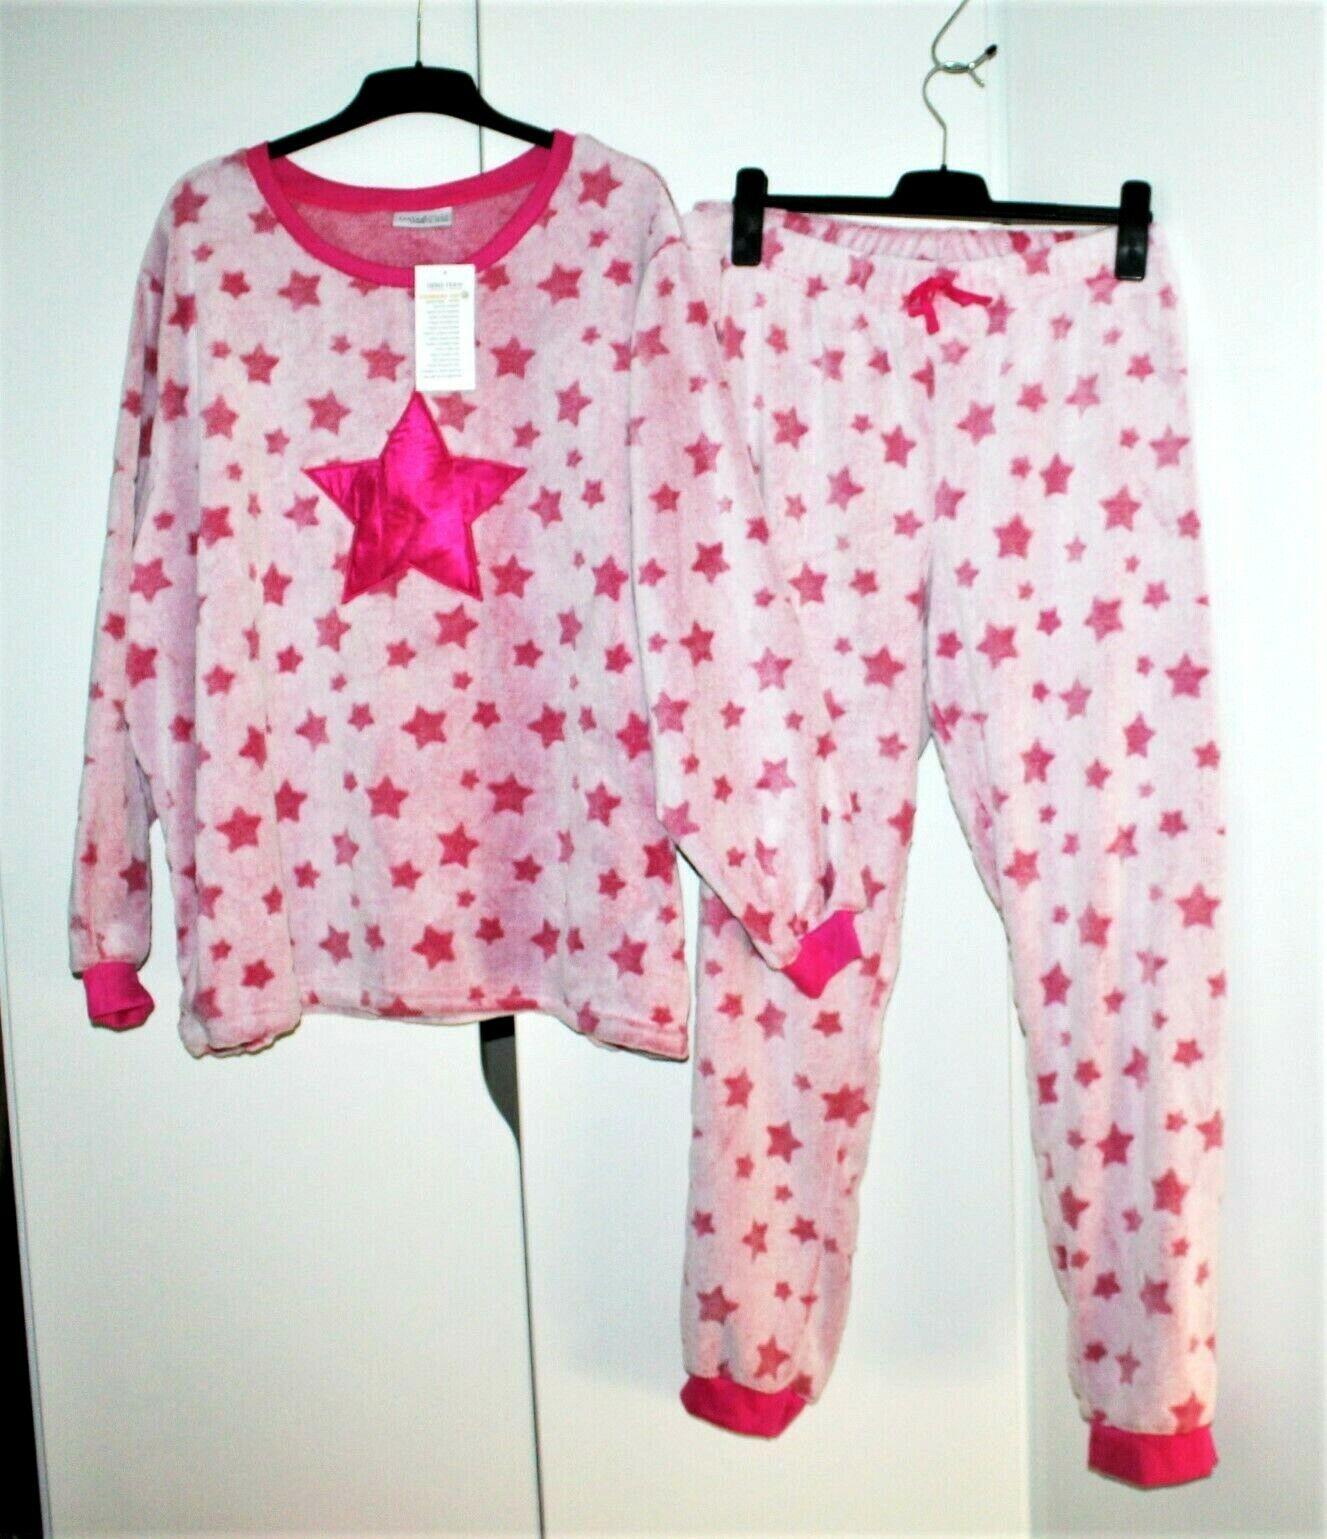 Janina Damen Neu Kuschelschlafanzug Pijama Hausanzug Freizeitanzug Gr. 3XL 56/58